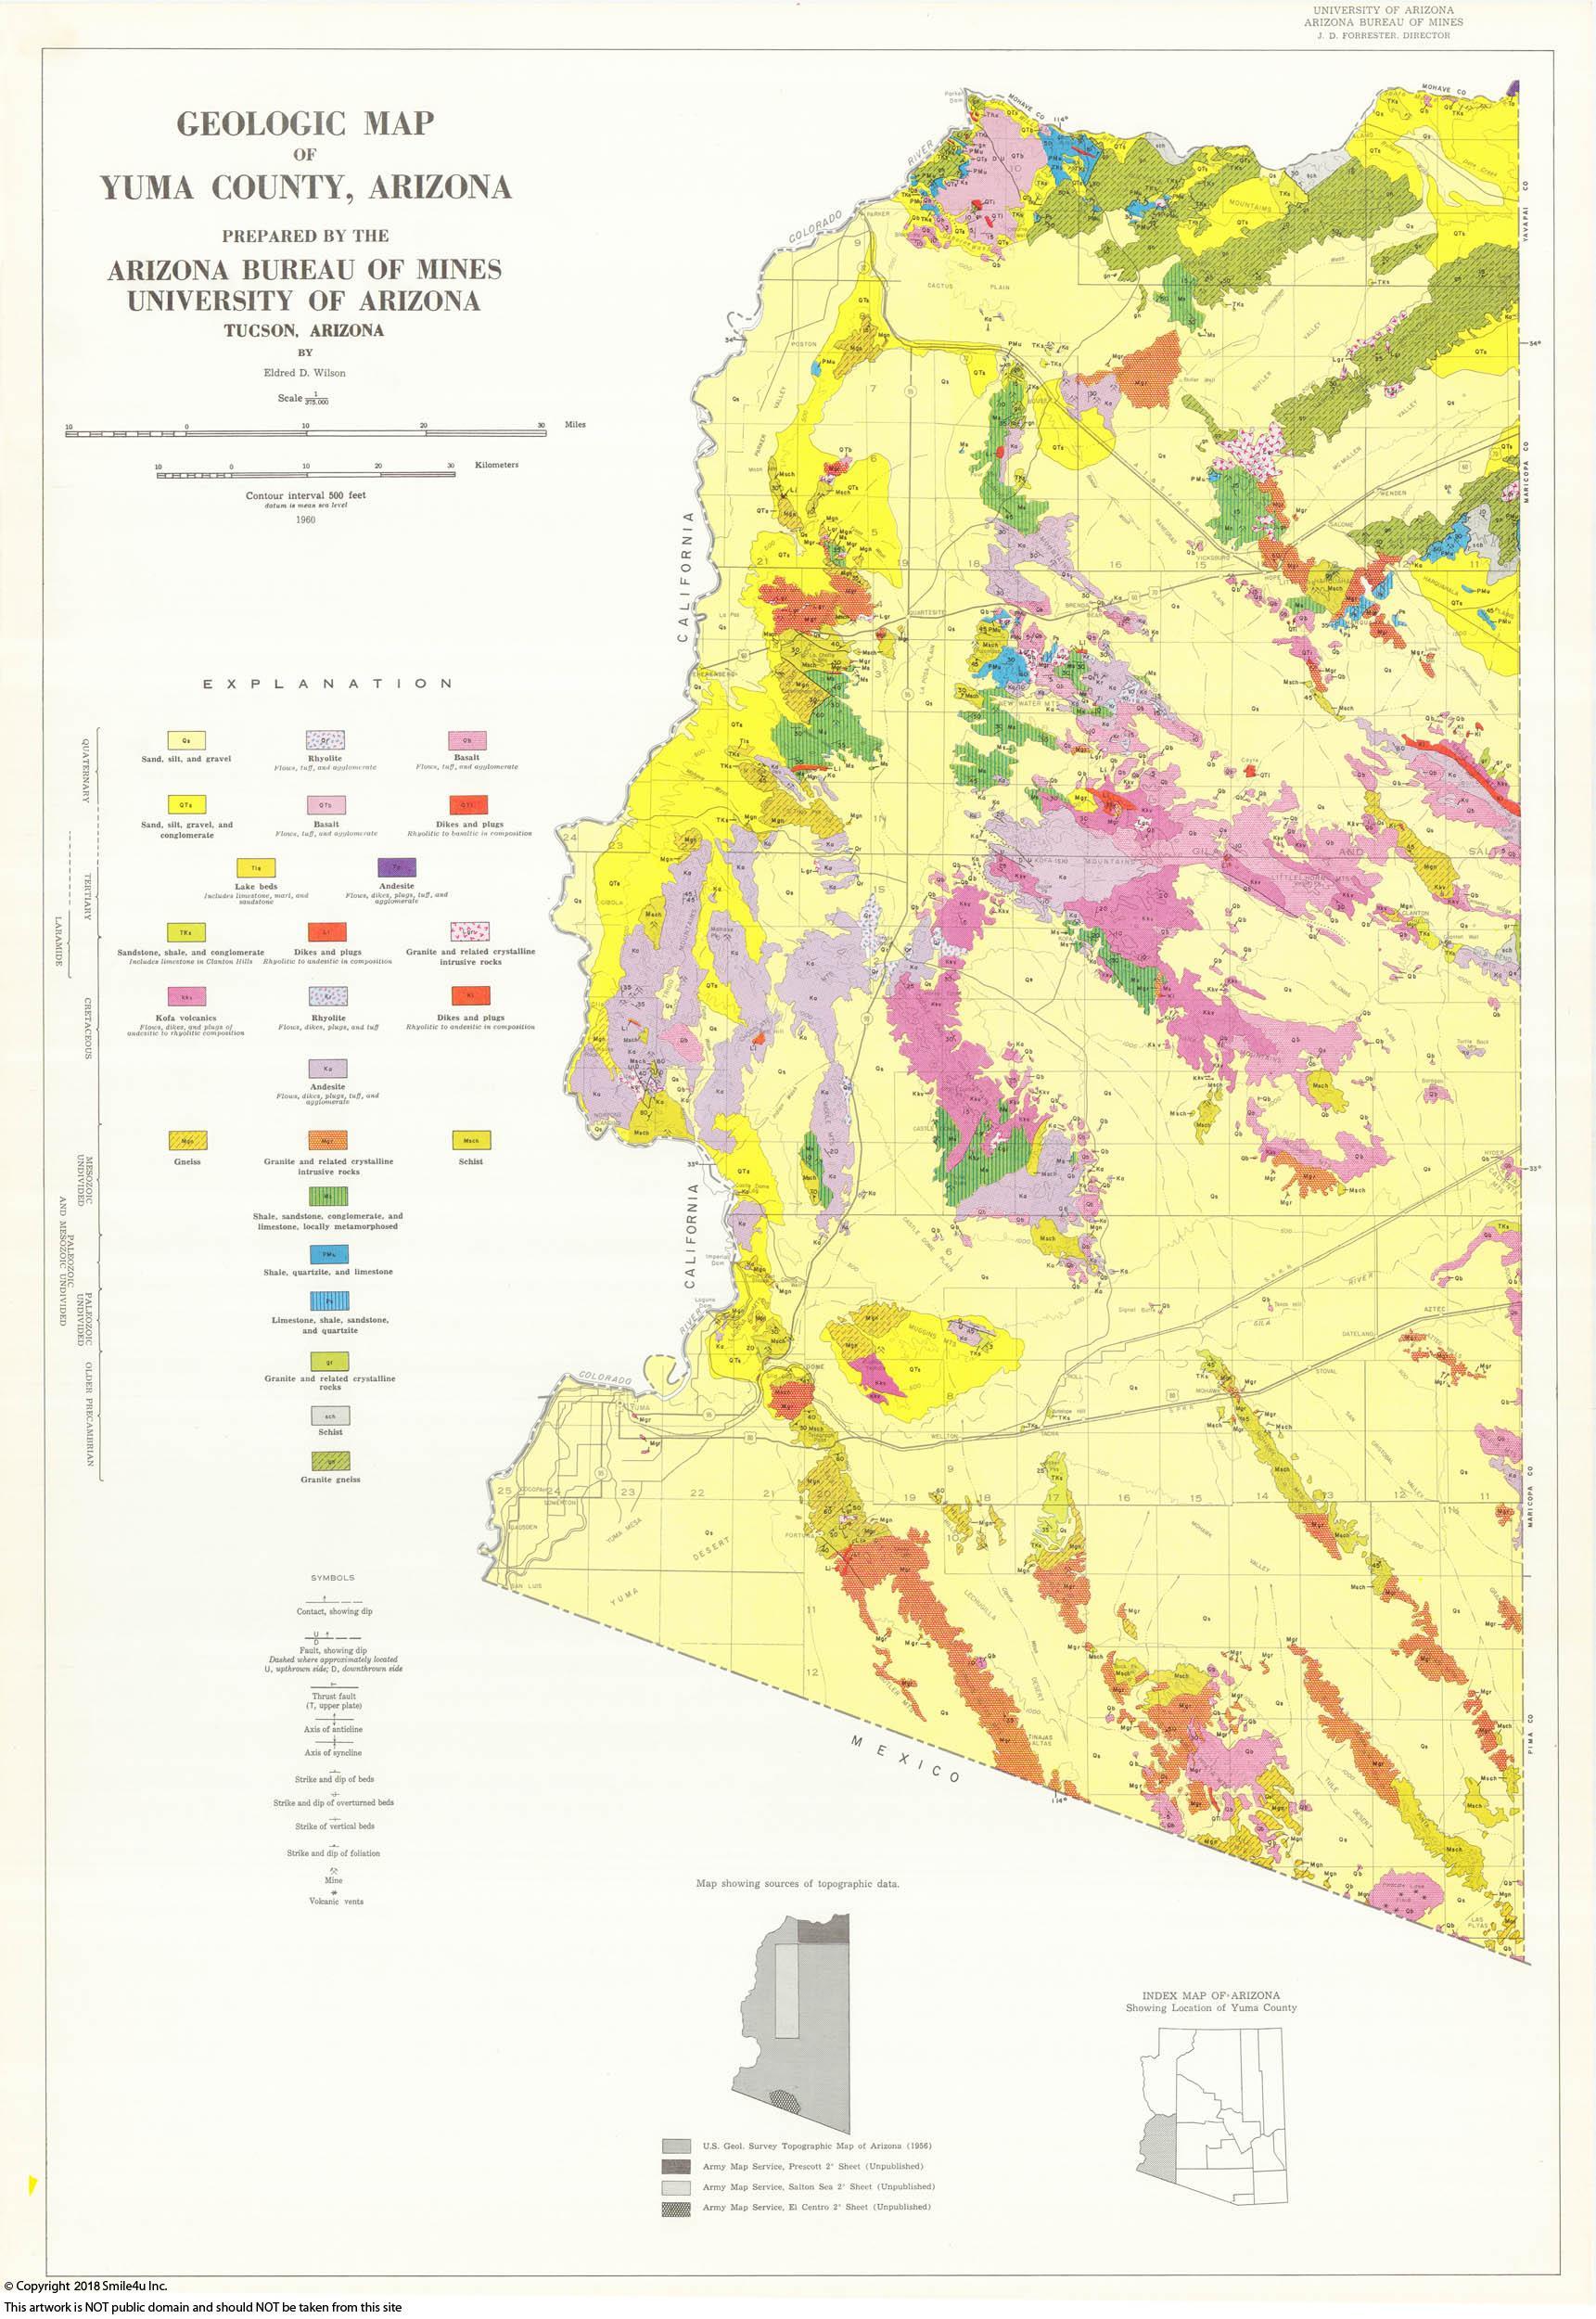 655951_watermarked_yumacounty_1960_geologicmap.jpg